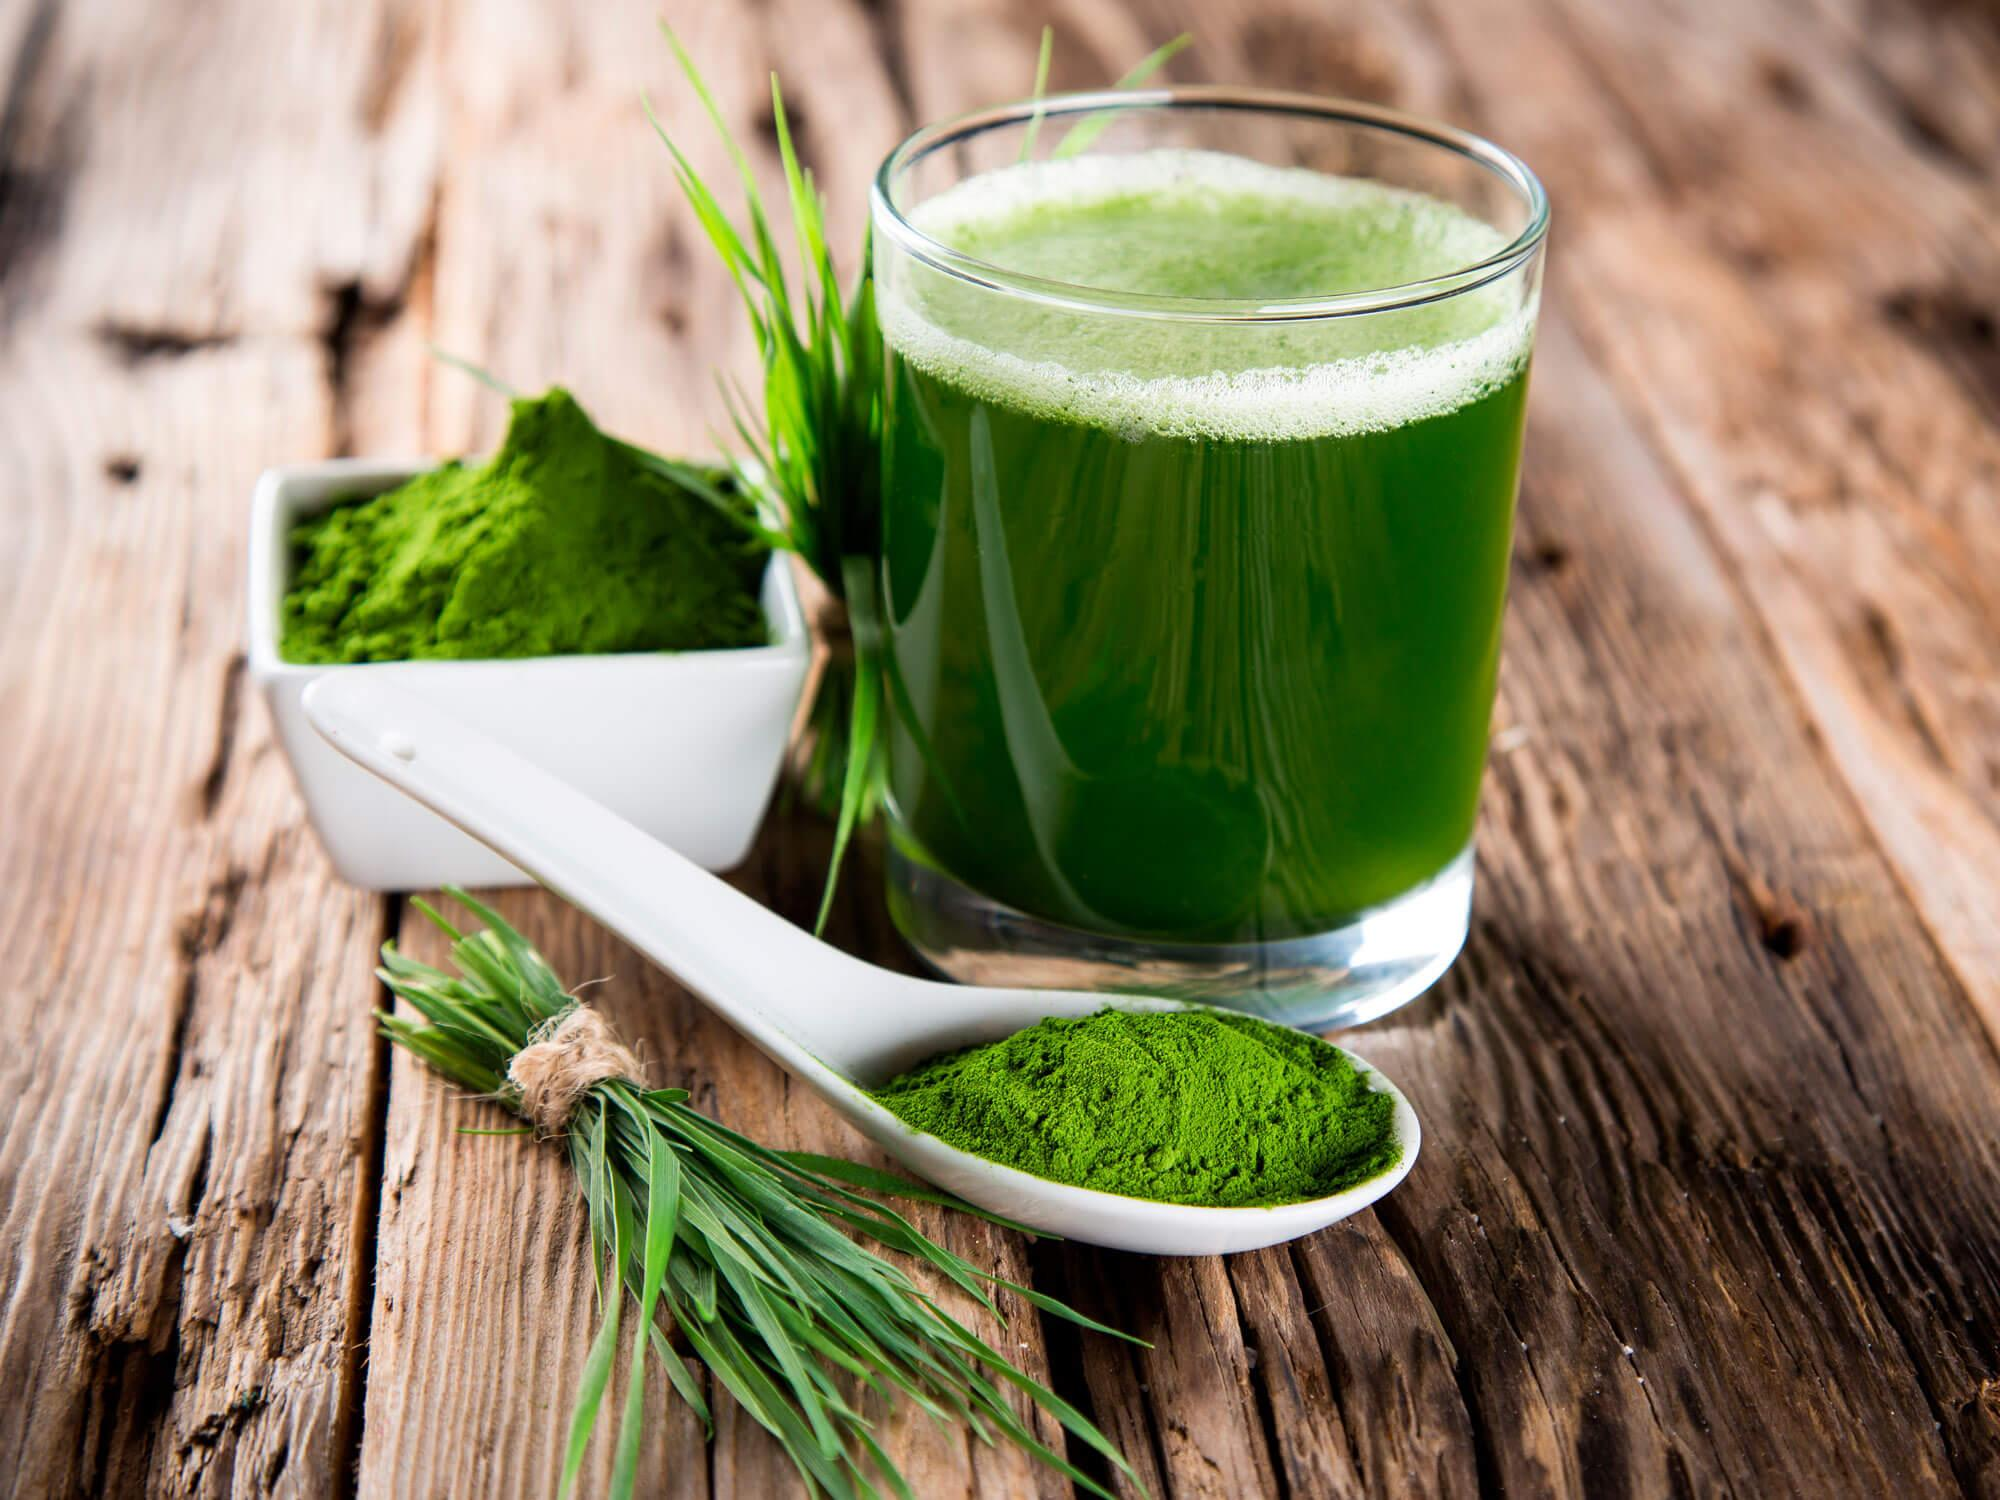 Greens Powder Ingredients